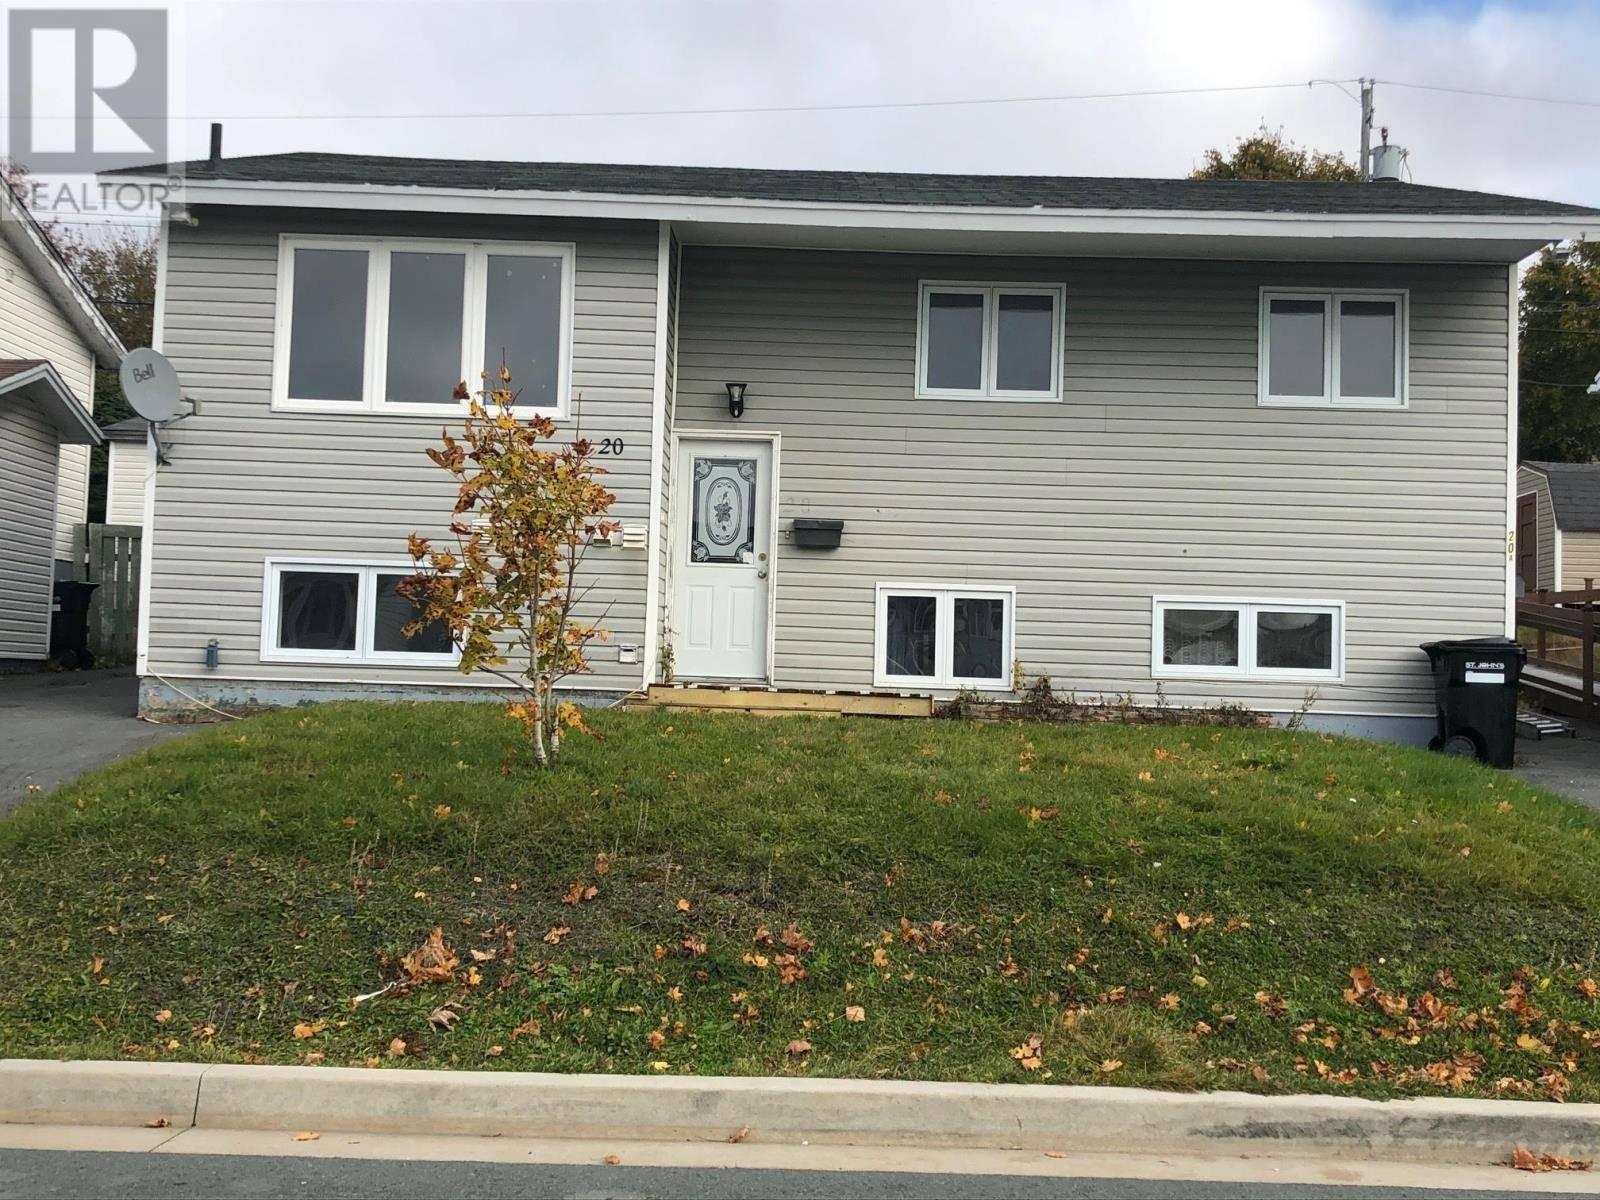 House for sale at 20 Gorman Ave St. John's Newfoundland - MLS: 1205713